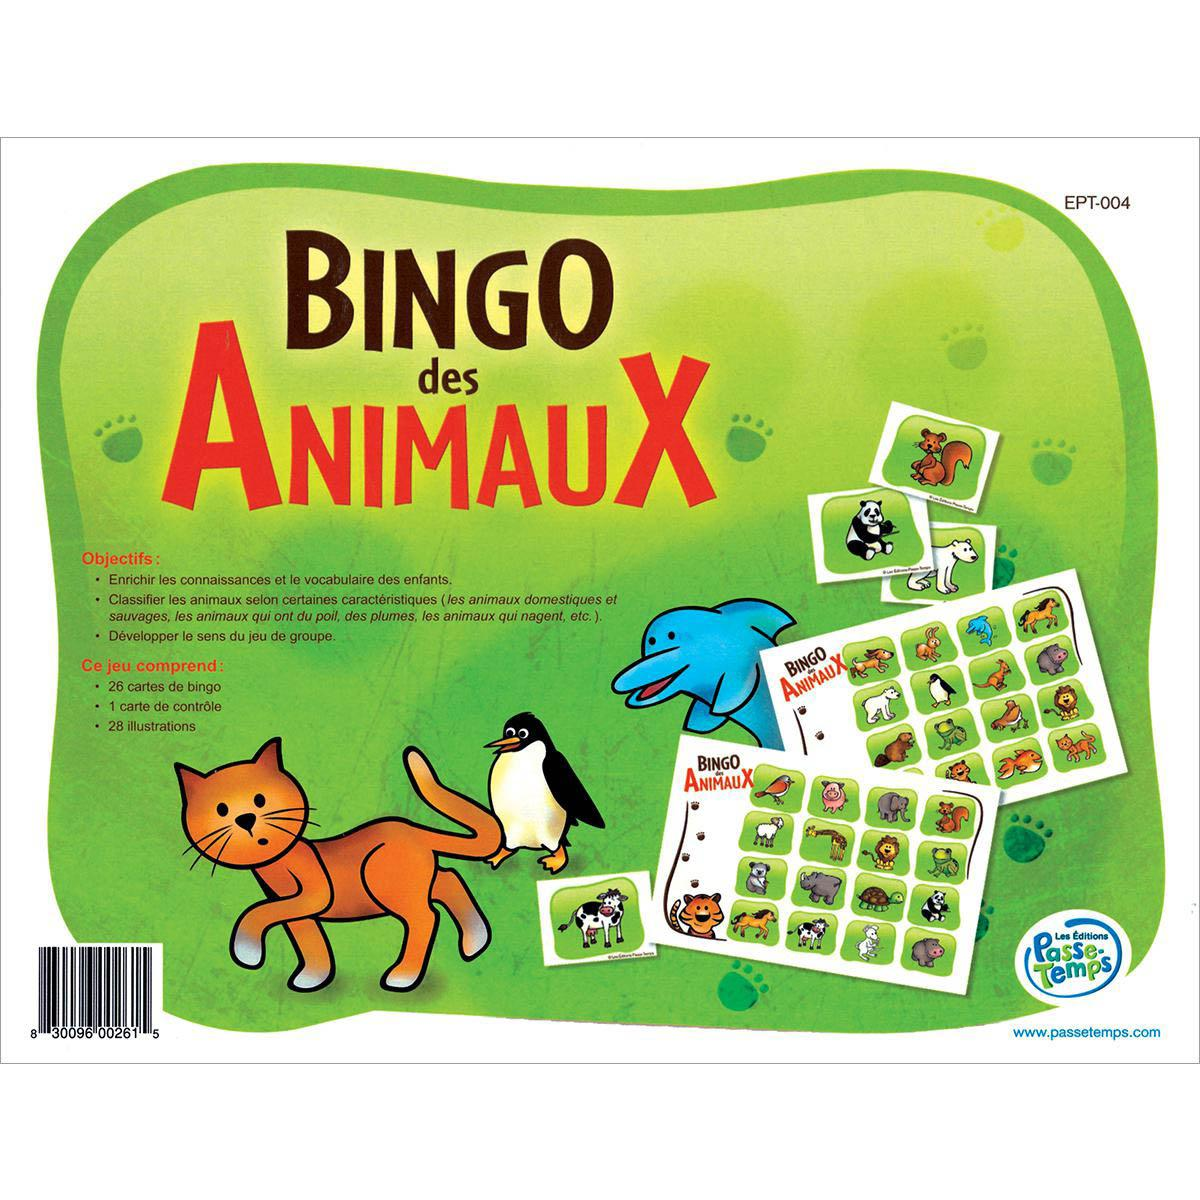 Bingo des animaux